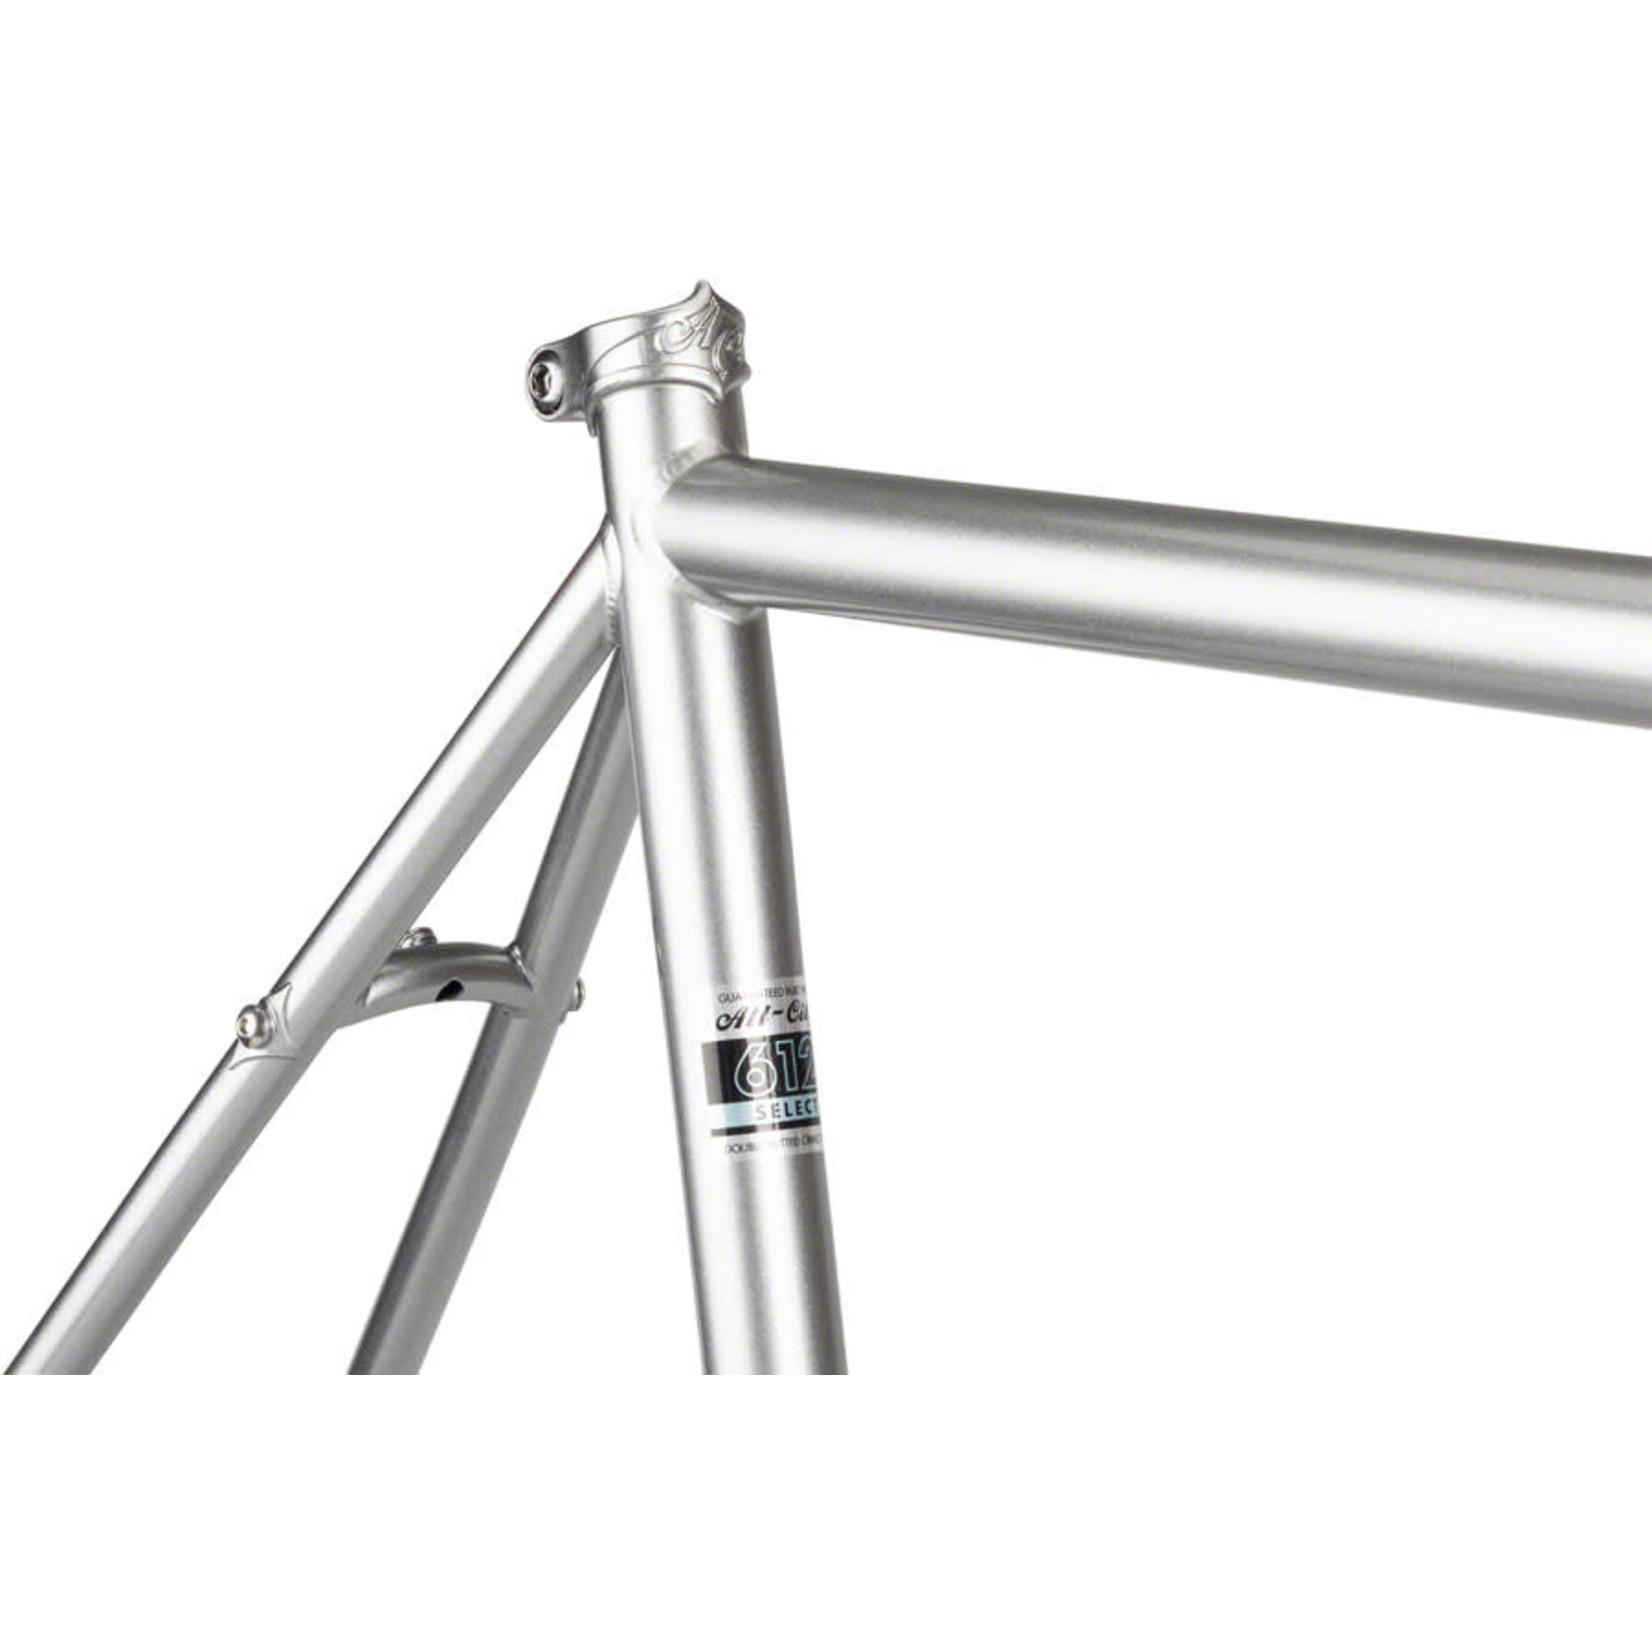 All-City All-City Super Professional Frameset - 700c / 650b, Steel, Quicksilver, 49cm